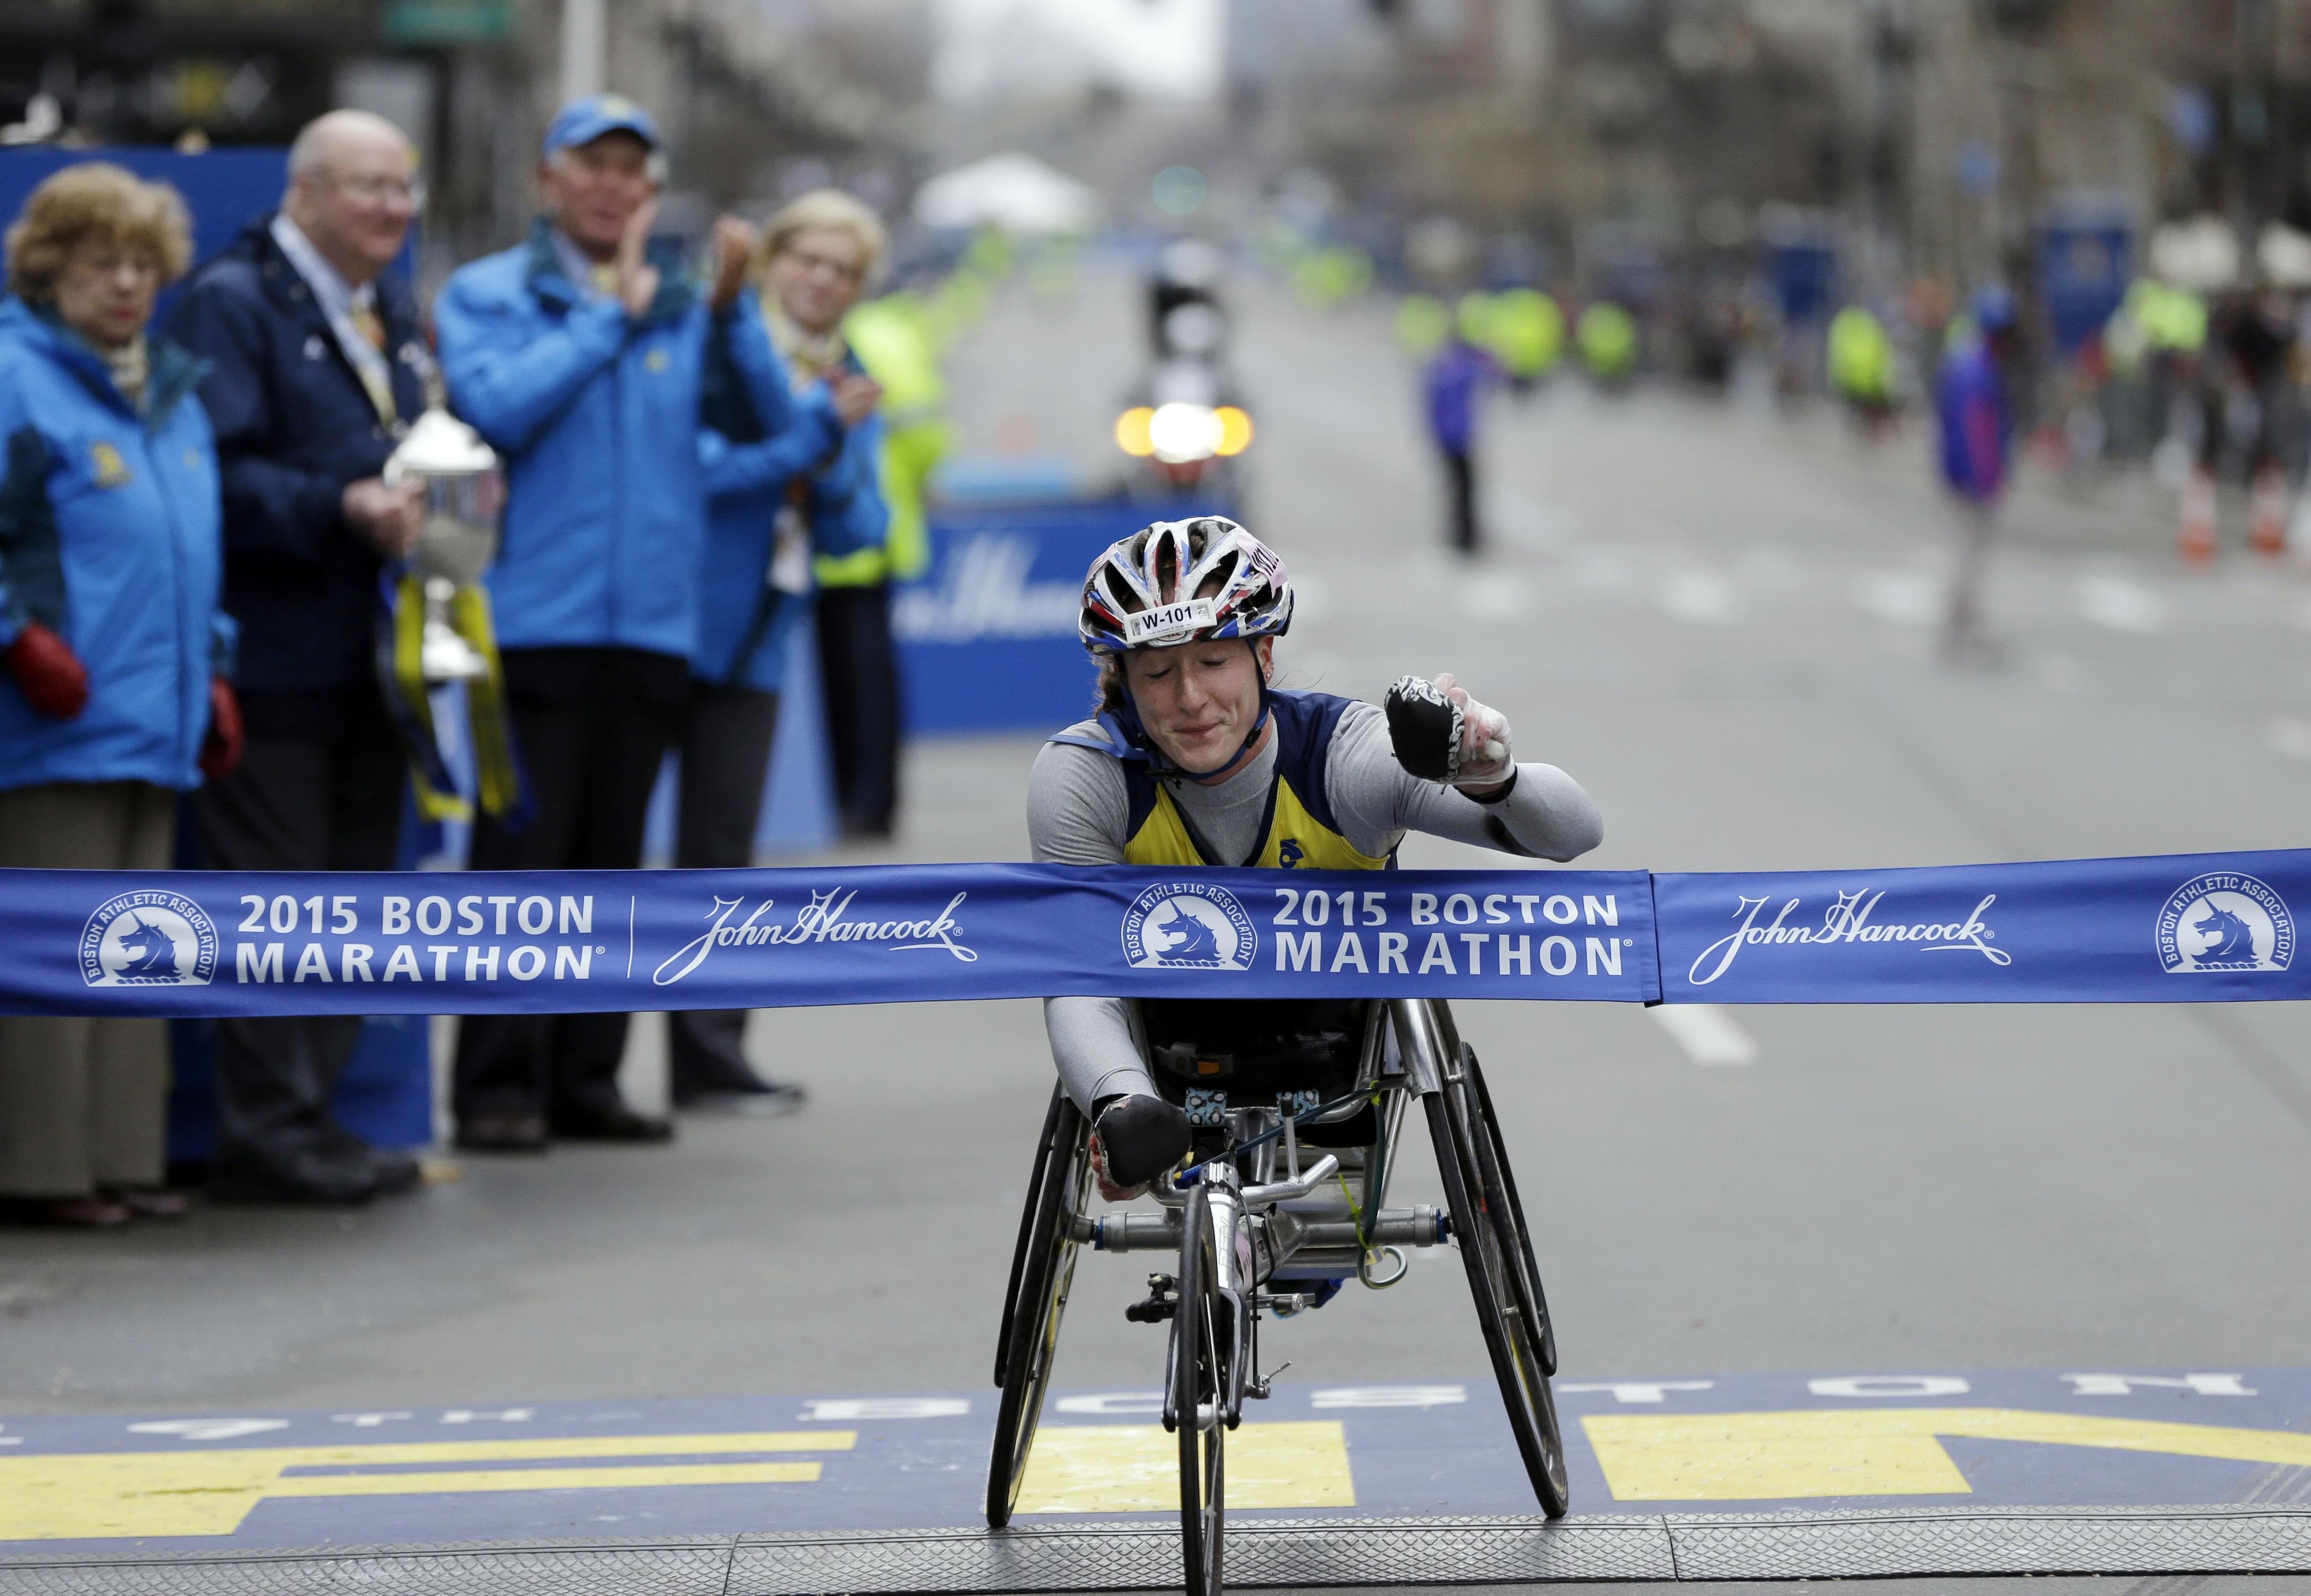 U of I graduate Tatyana McFadden crosses the finish line to win the women's wheelchair division of the Boston Marathon Monday.